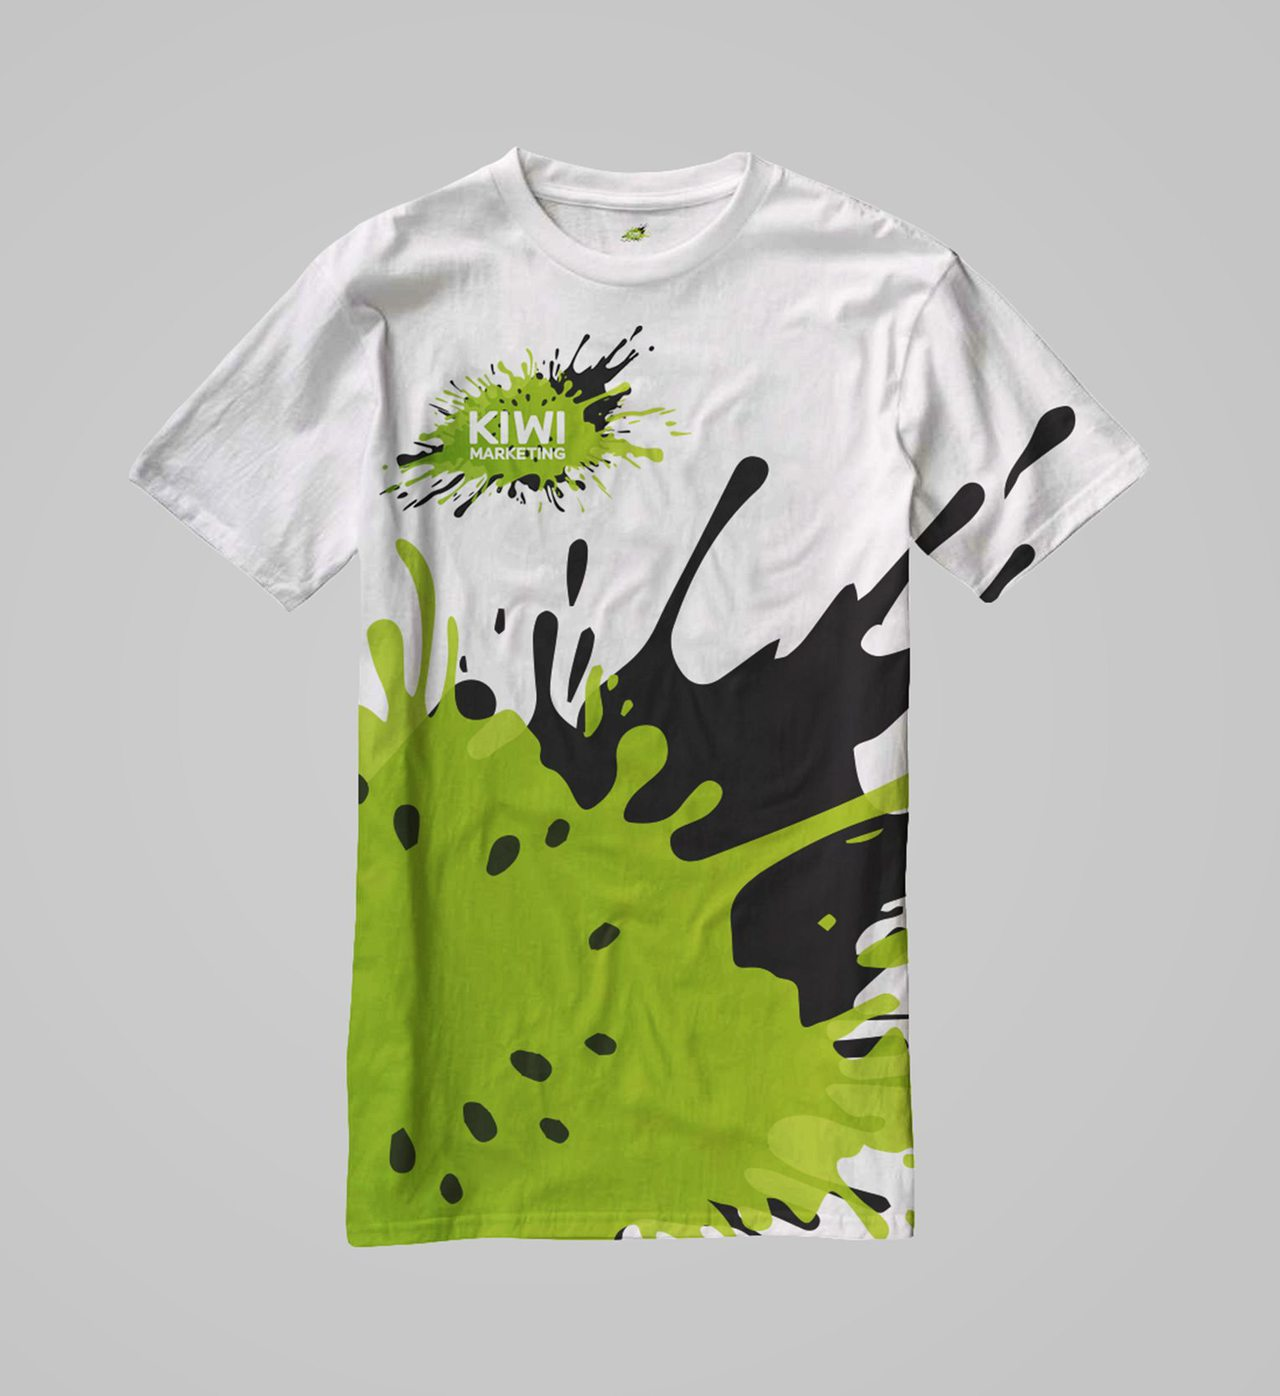 Kiwi Marketing Graphic Design